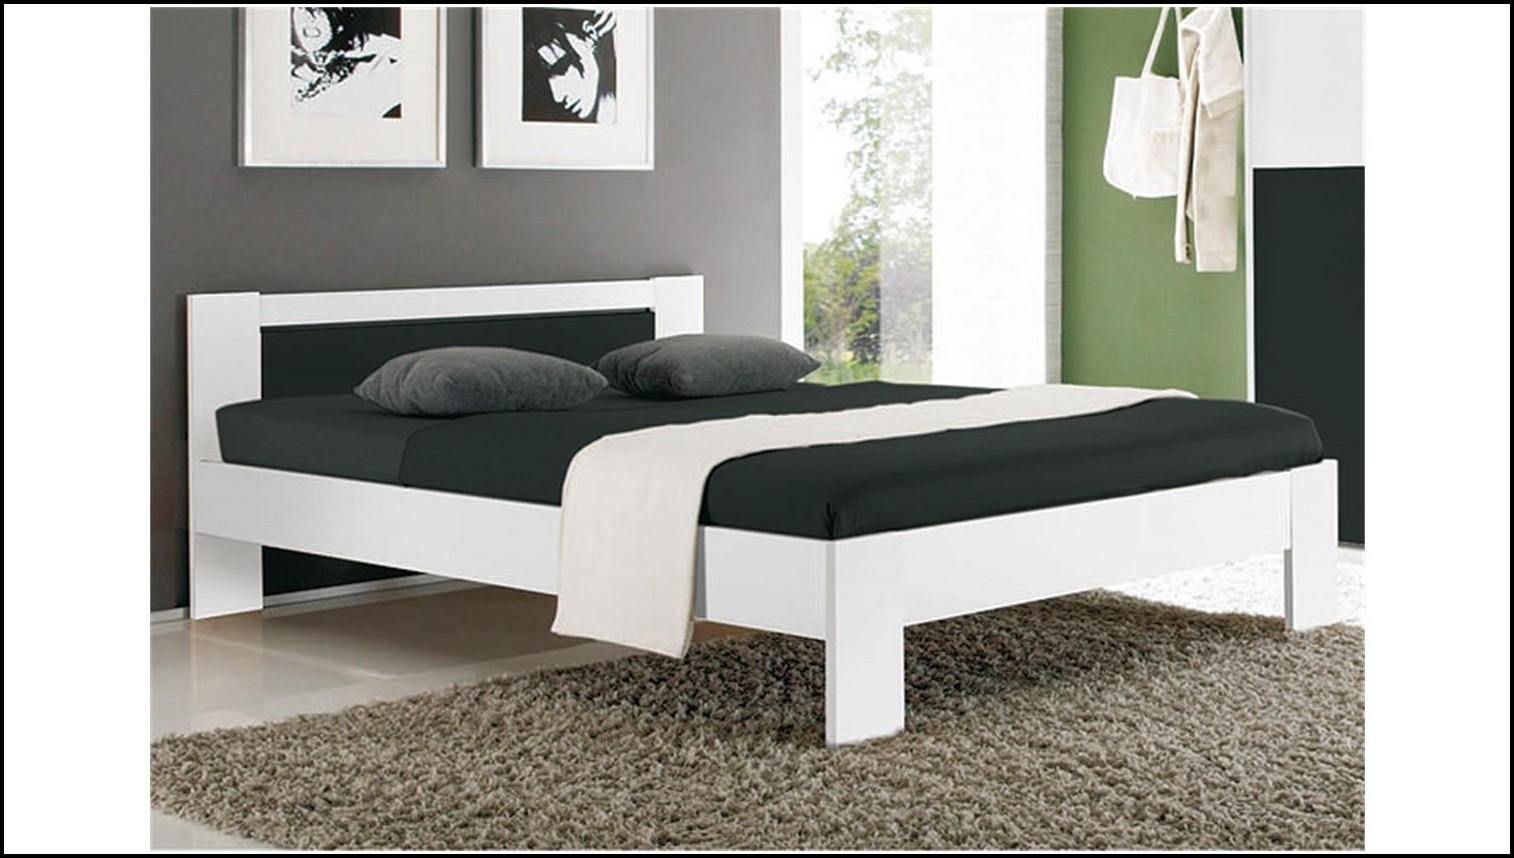 Bett 140×200 Inkl Matratze Und Lattenrost